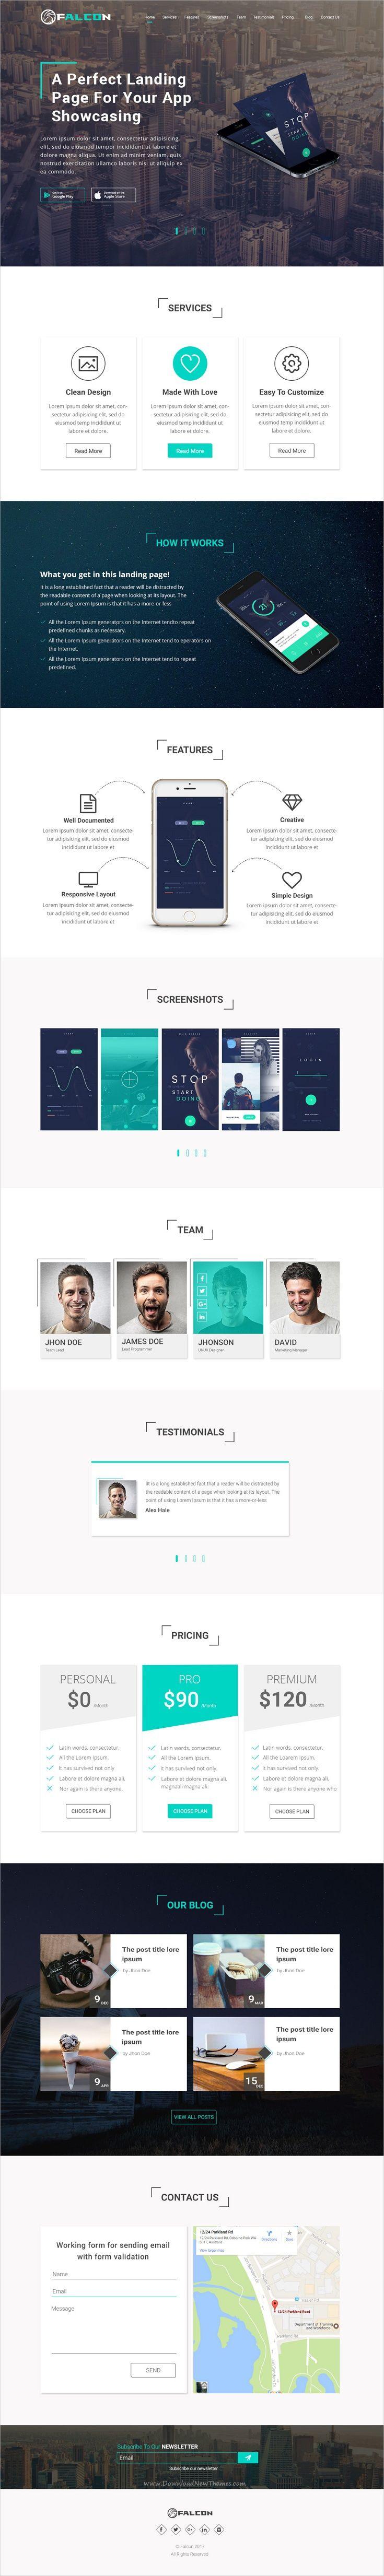 Falcon is clean and unique design #PSD template for #app showcase landing page website download now➩ https://themeforest.net/item/falcon-mobile-app-landingpage/19496090?ref=Datasata